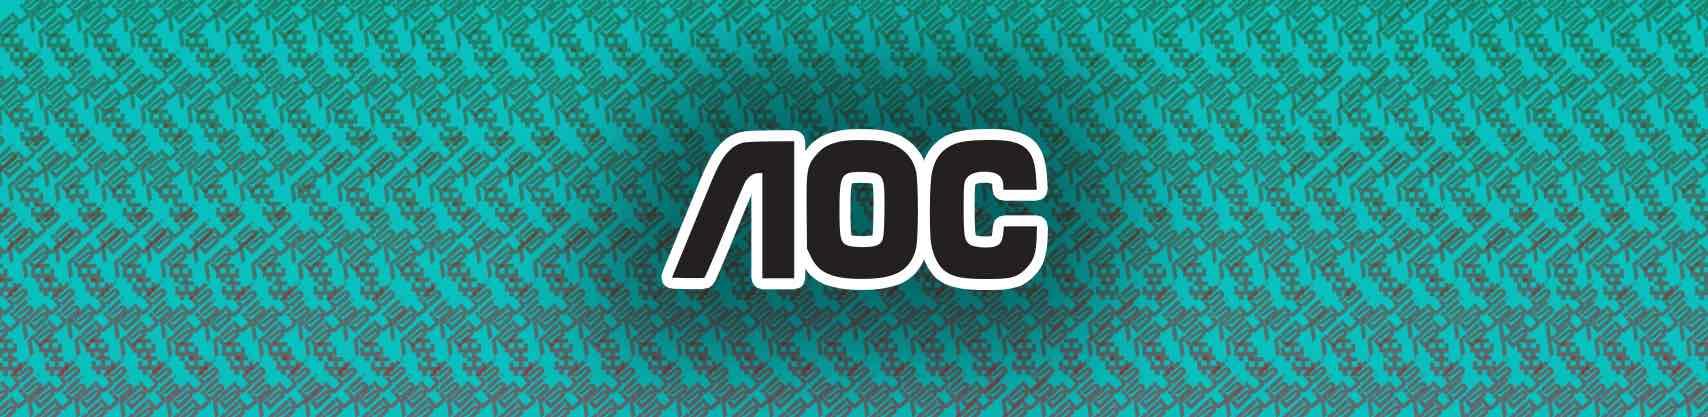 AOC U2879VF Manual